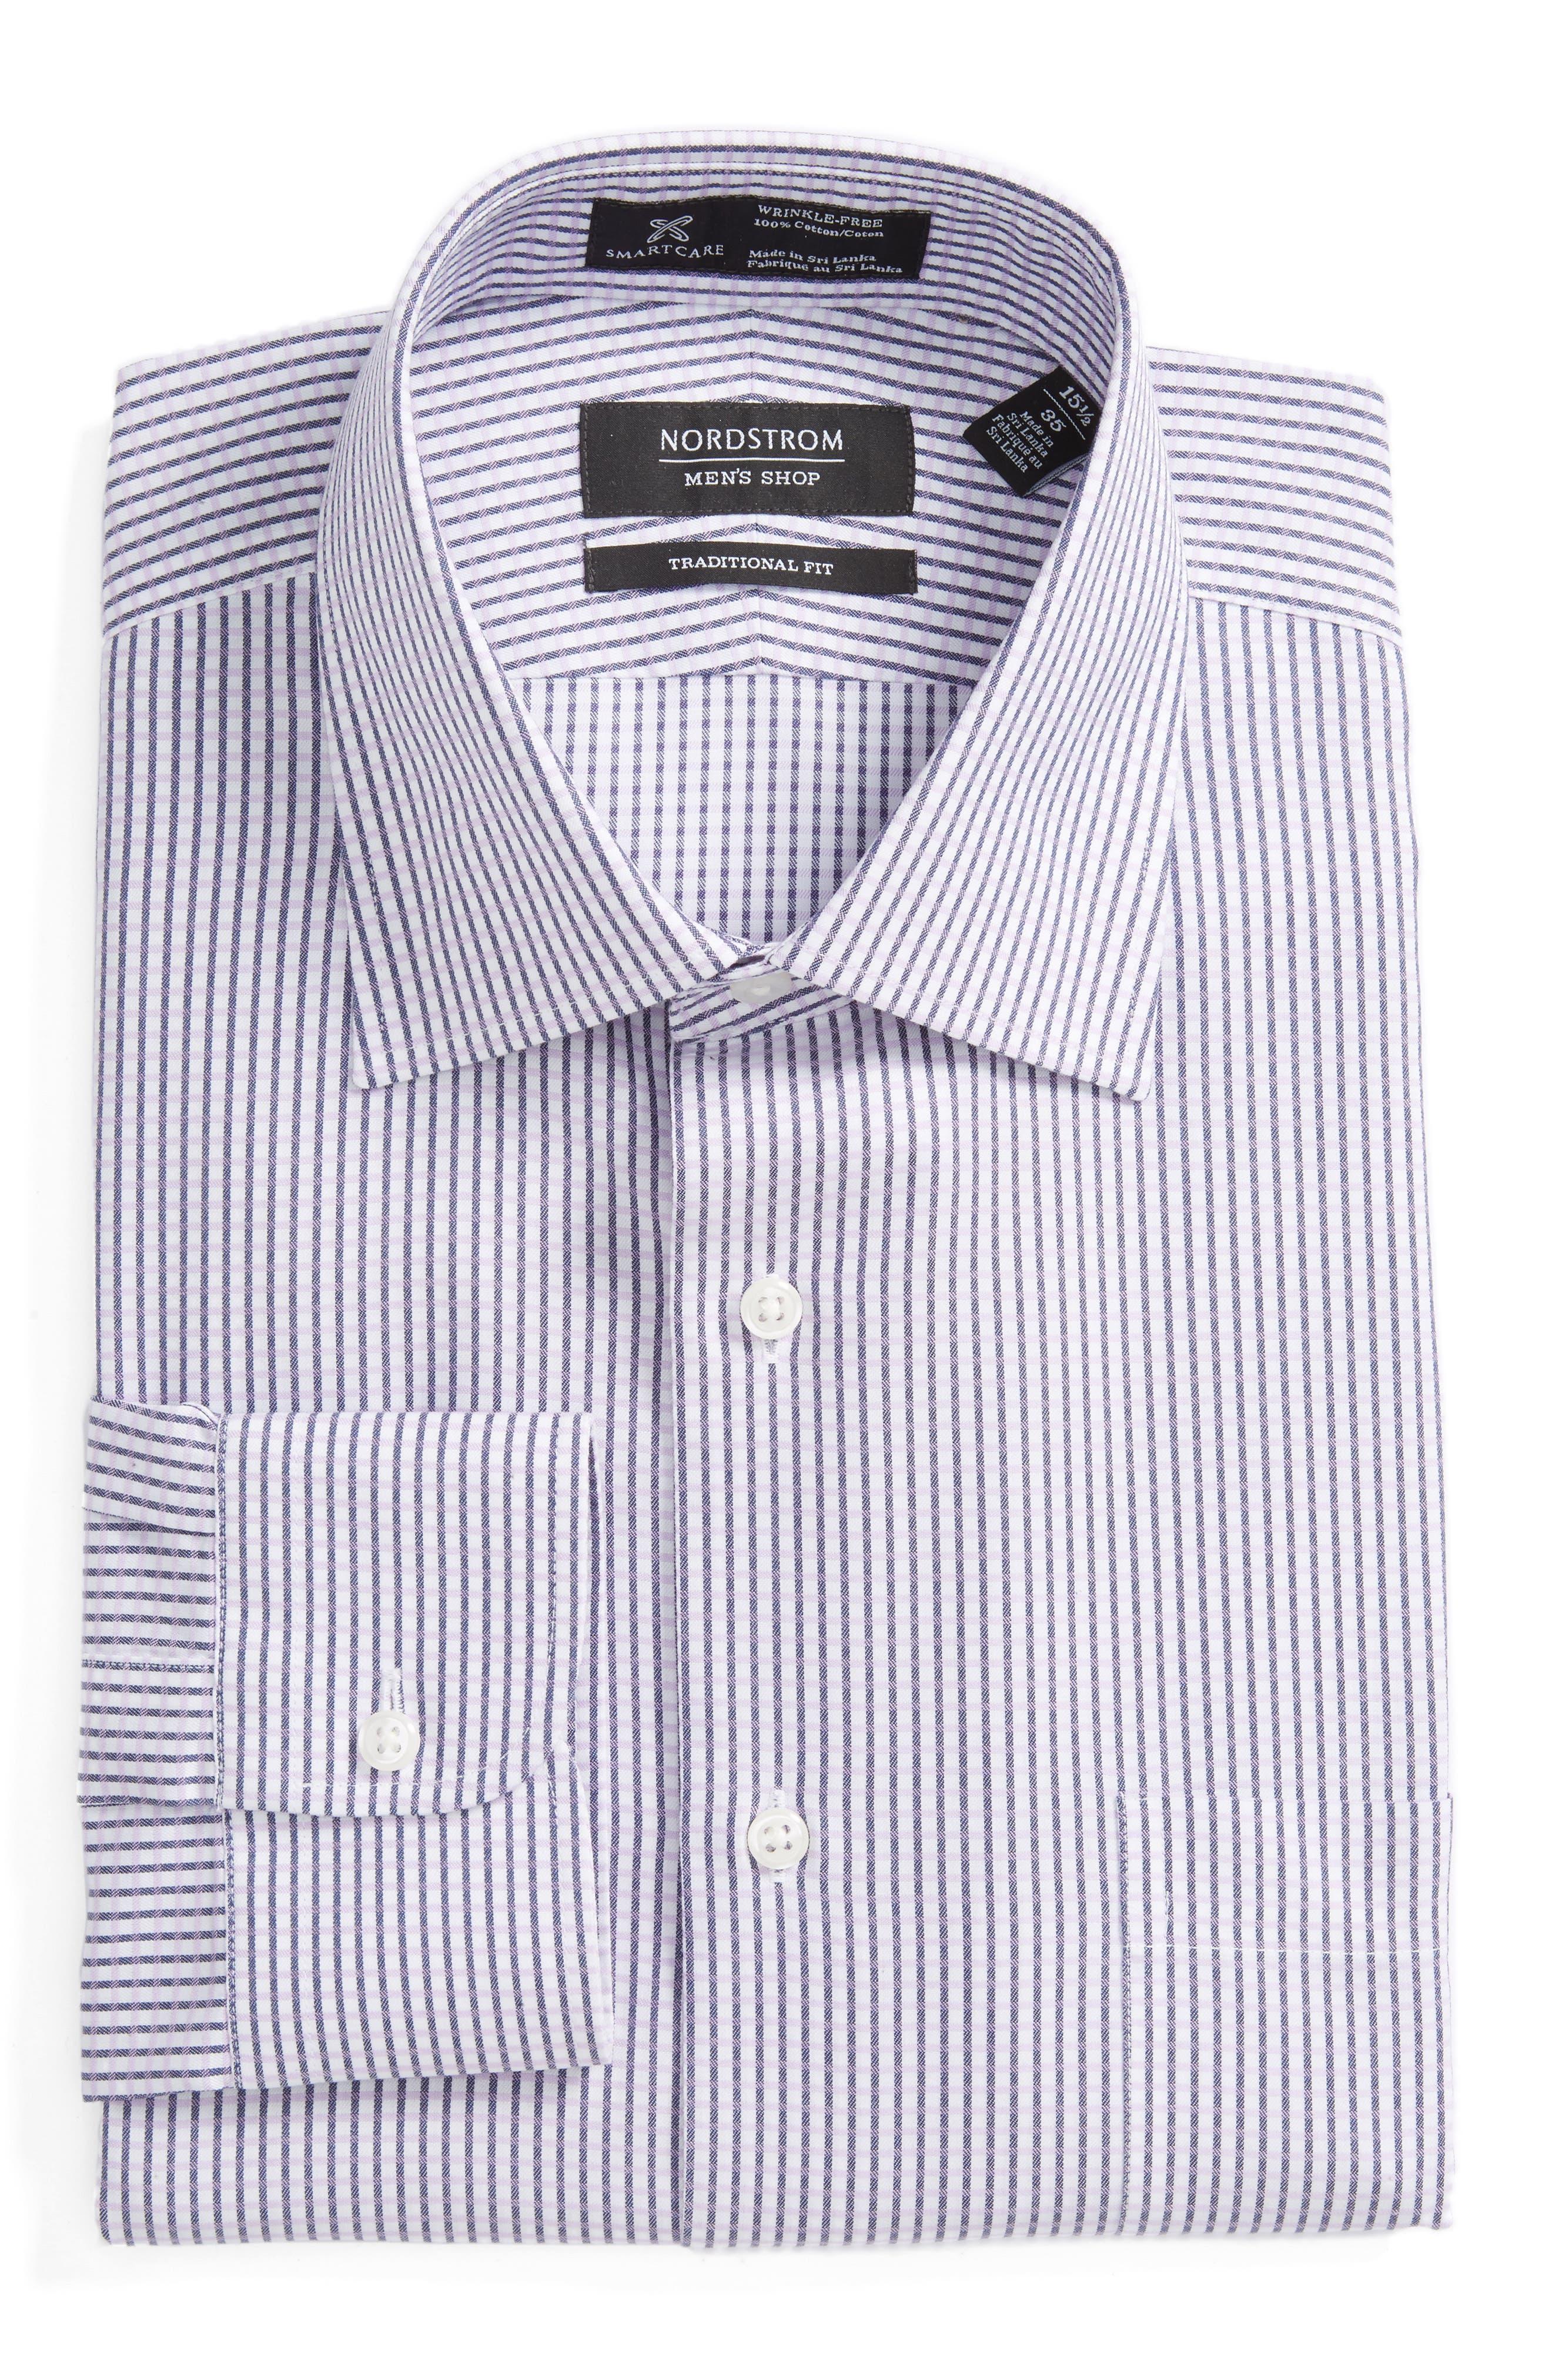 Main Image - Nordstrom Men's Shop Smartcare™ Traditional Fit Check Dress Shirt